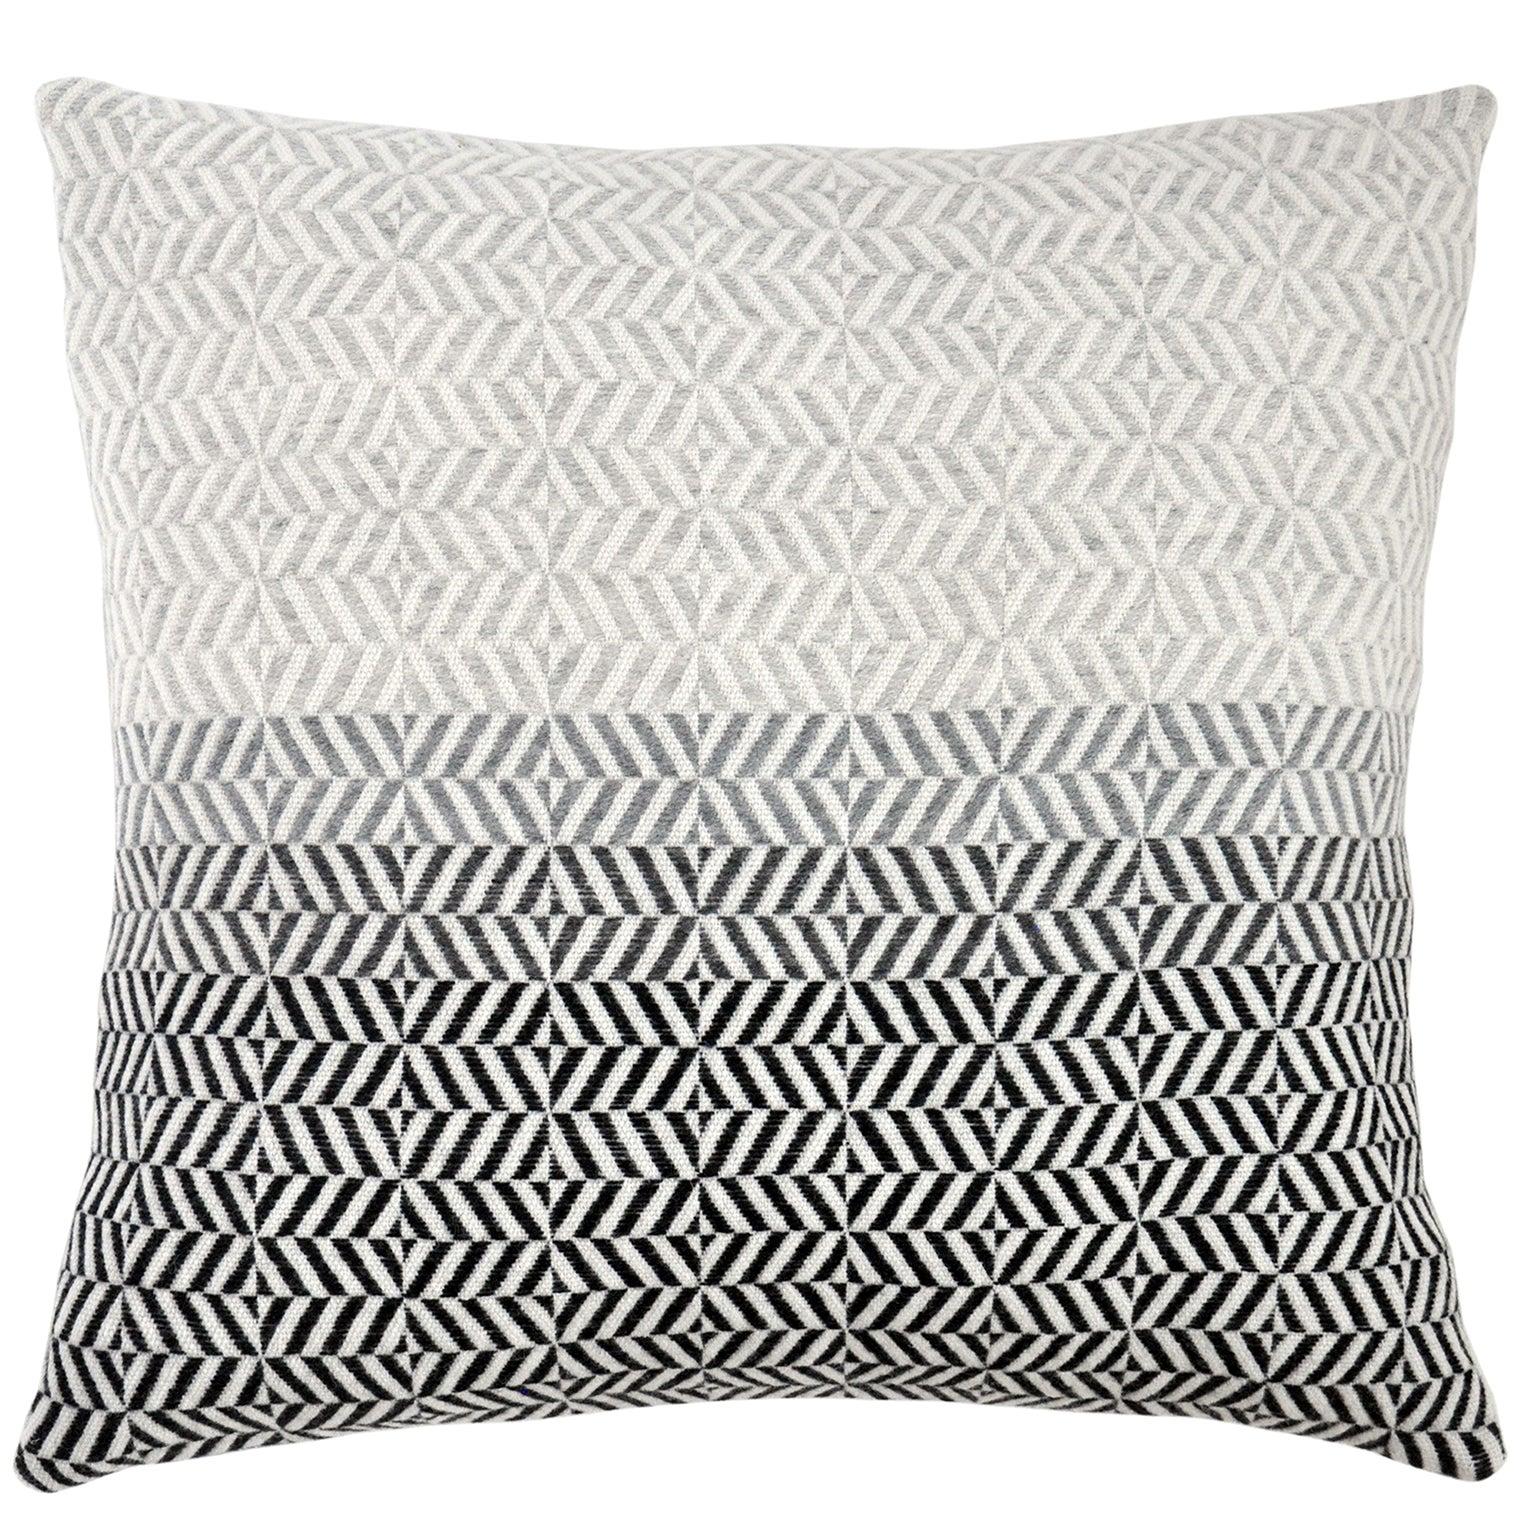 Handwoven 'Uccle' Block Geometric Merino Wool Cushion Pillow, Pearl Grey